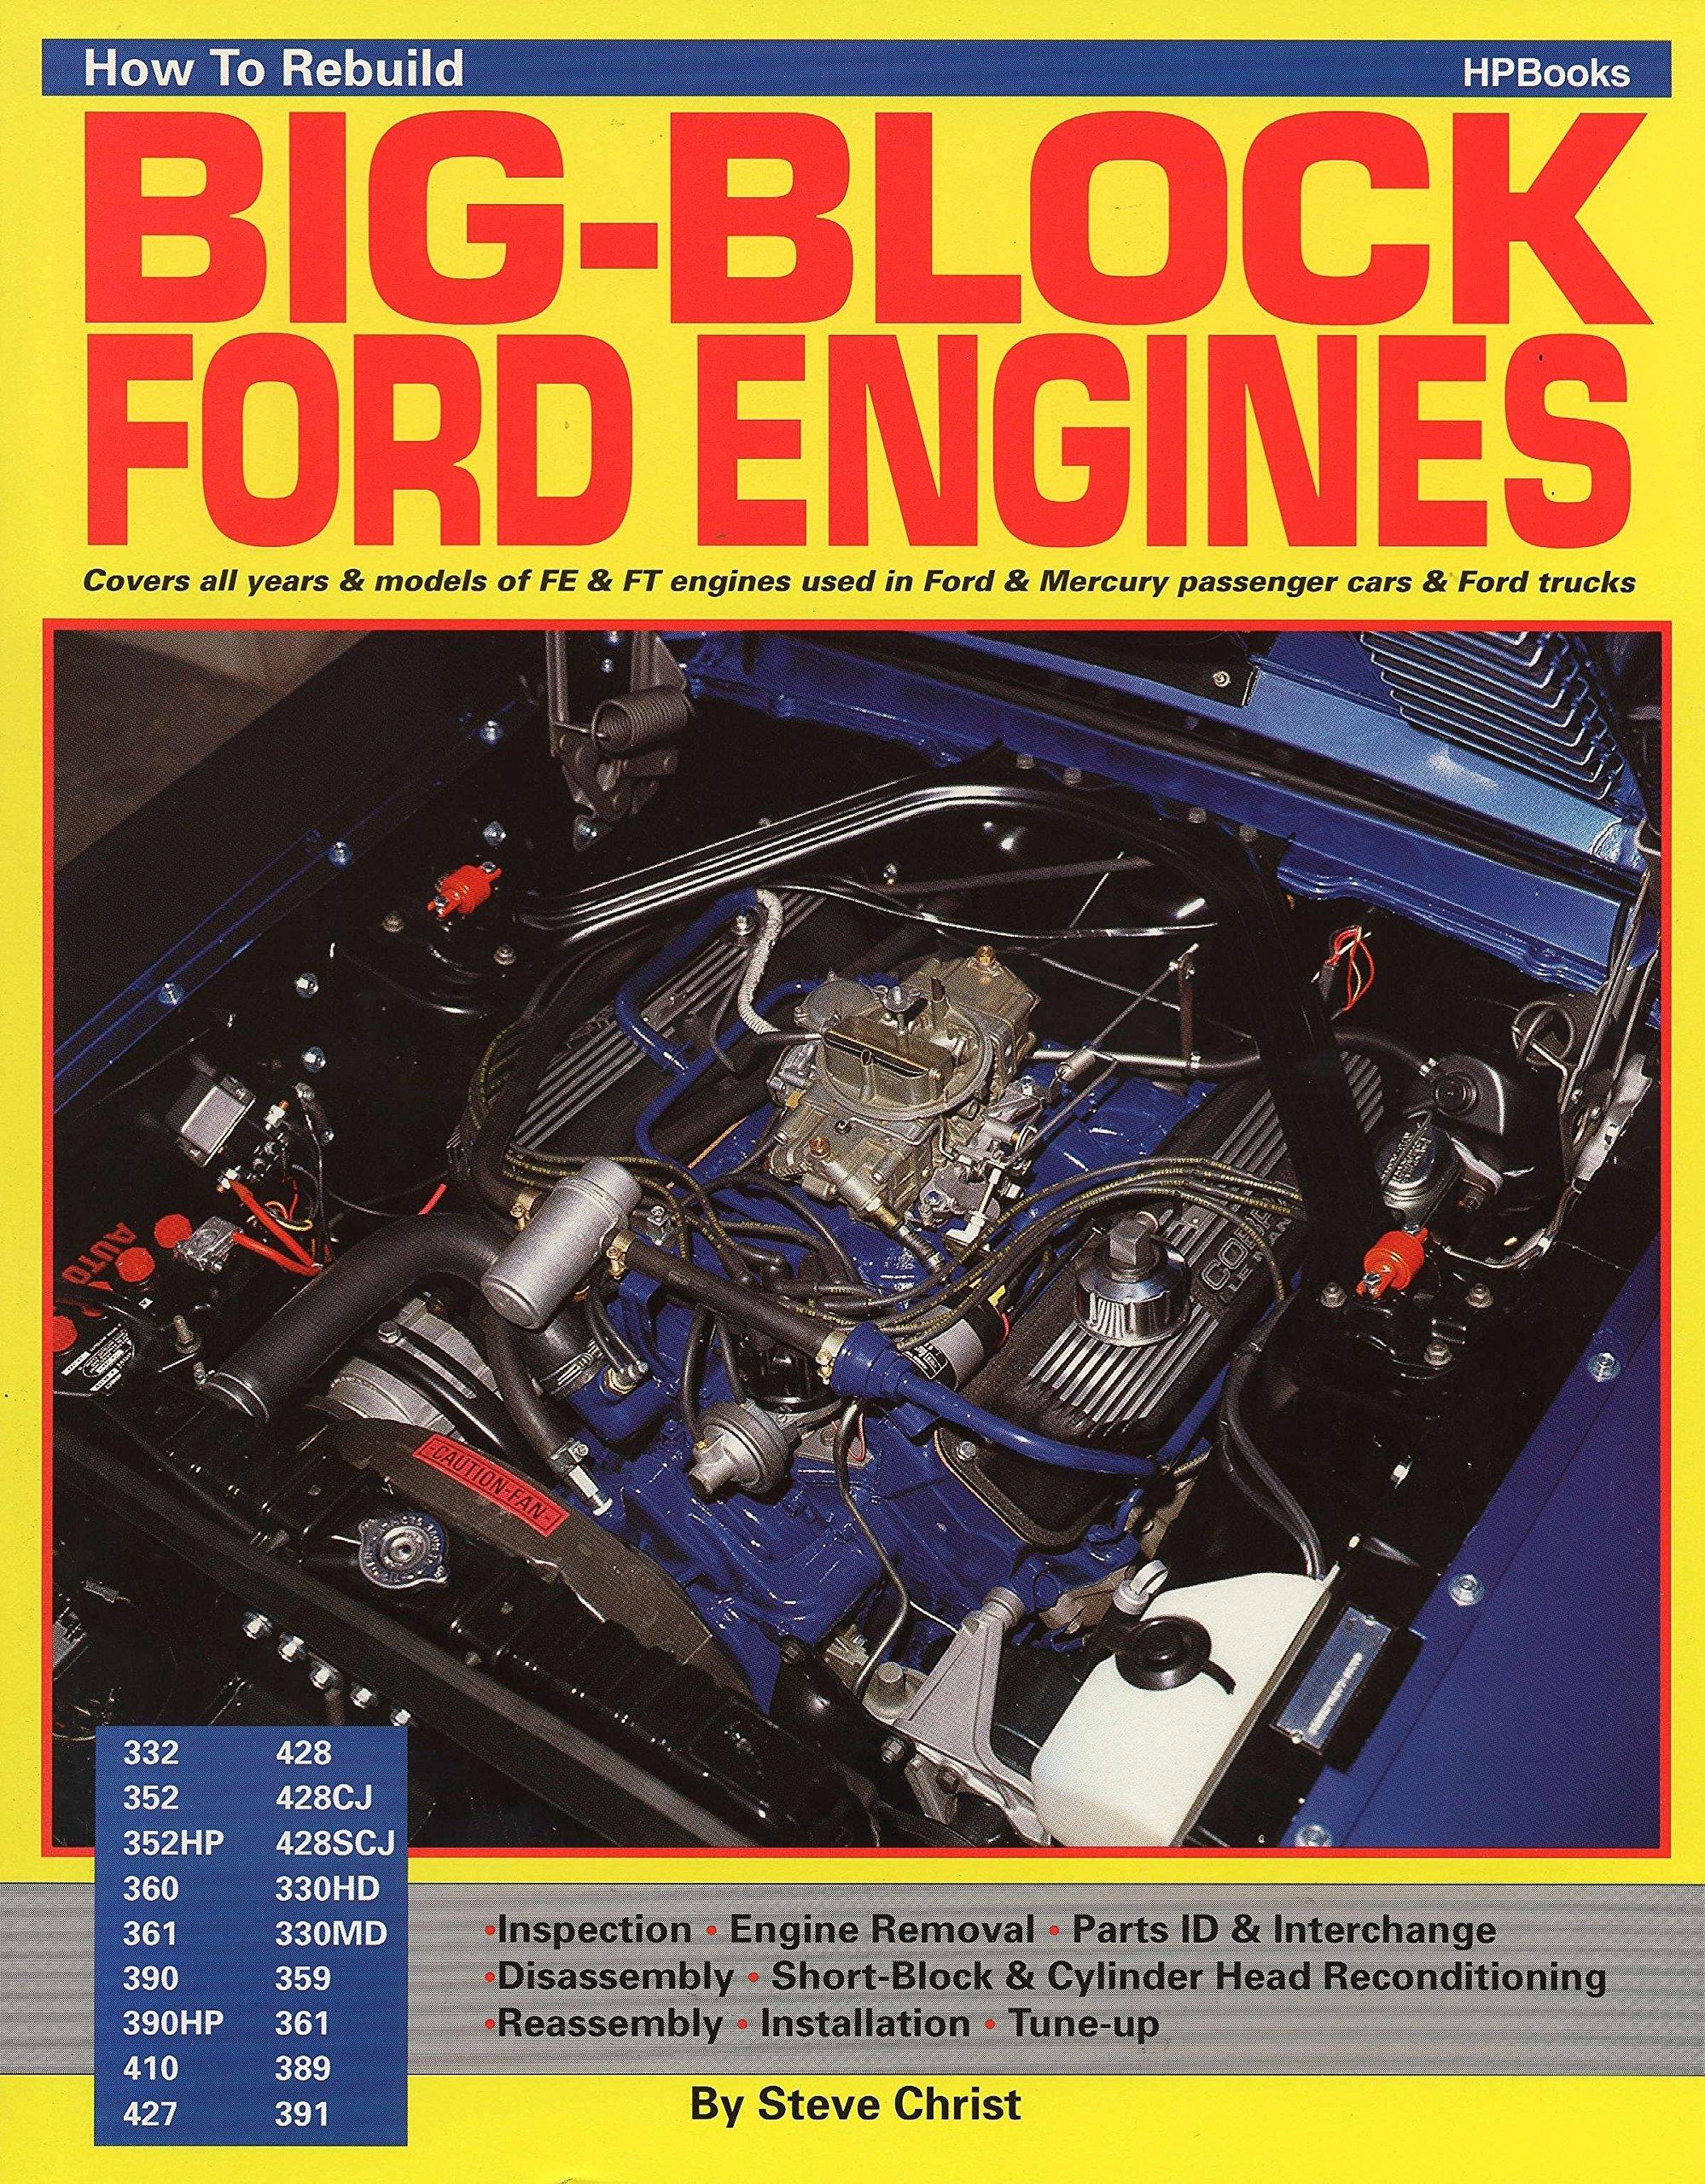 manual transmission ford big block